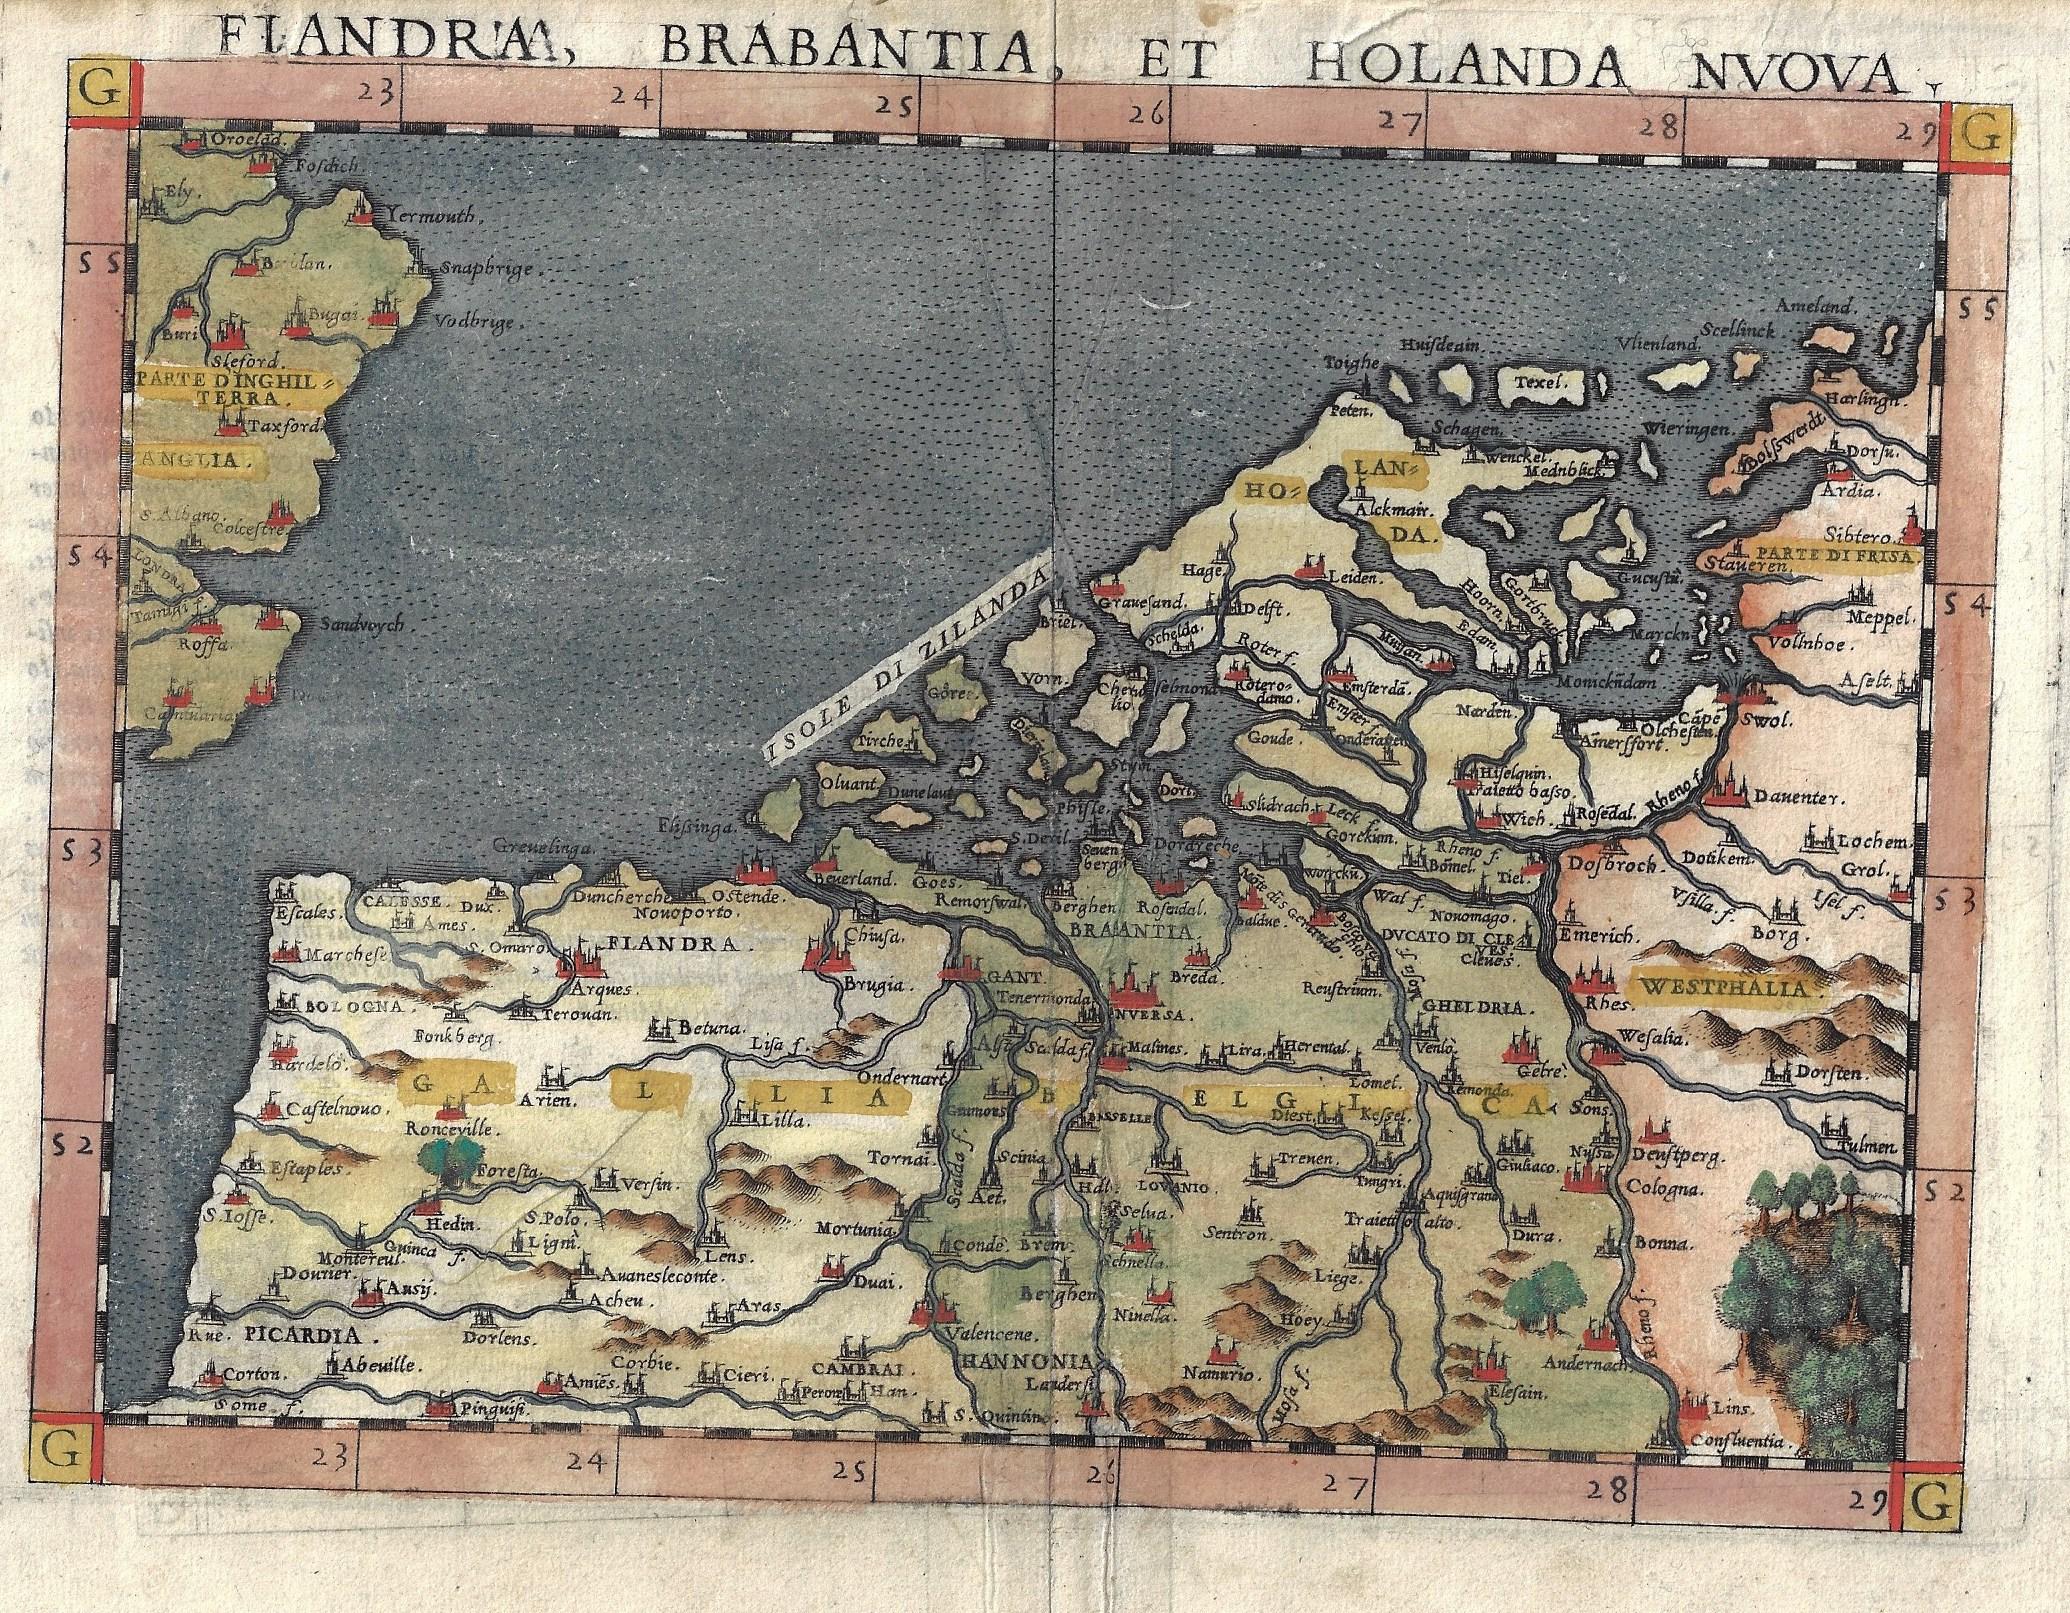 Ruscelli Girolamo Flandria, Brabantia, et Holanda Nuova.